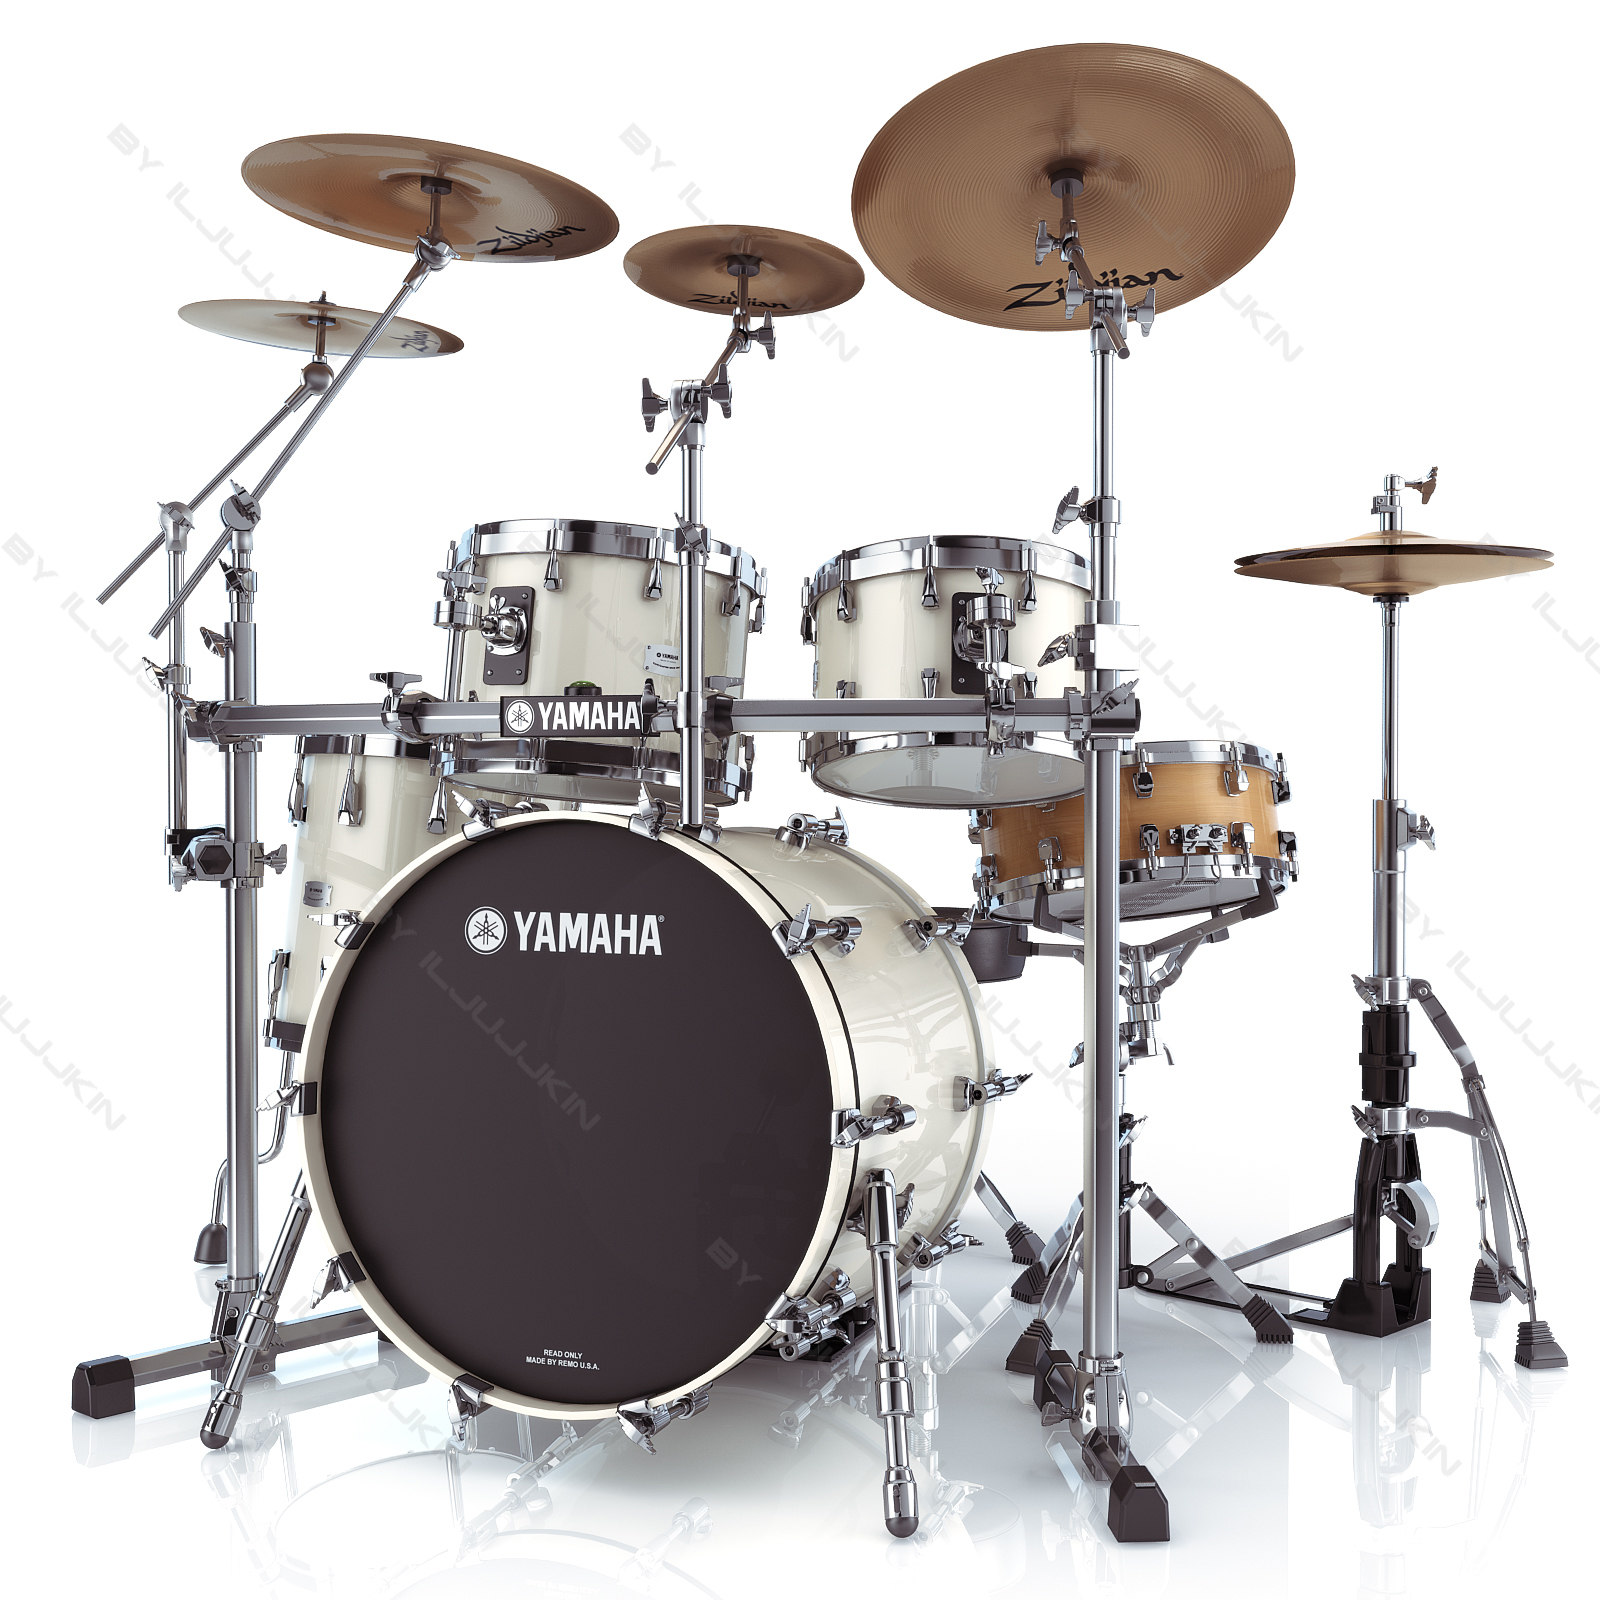 Drums_Yamaha_Absolute_Birch_0001.jpg